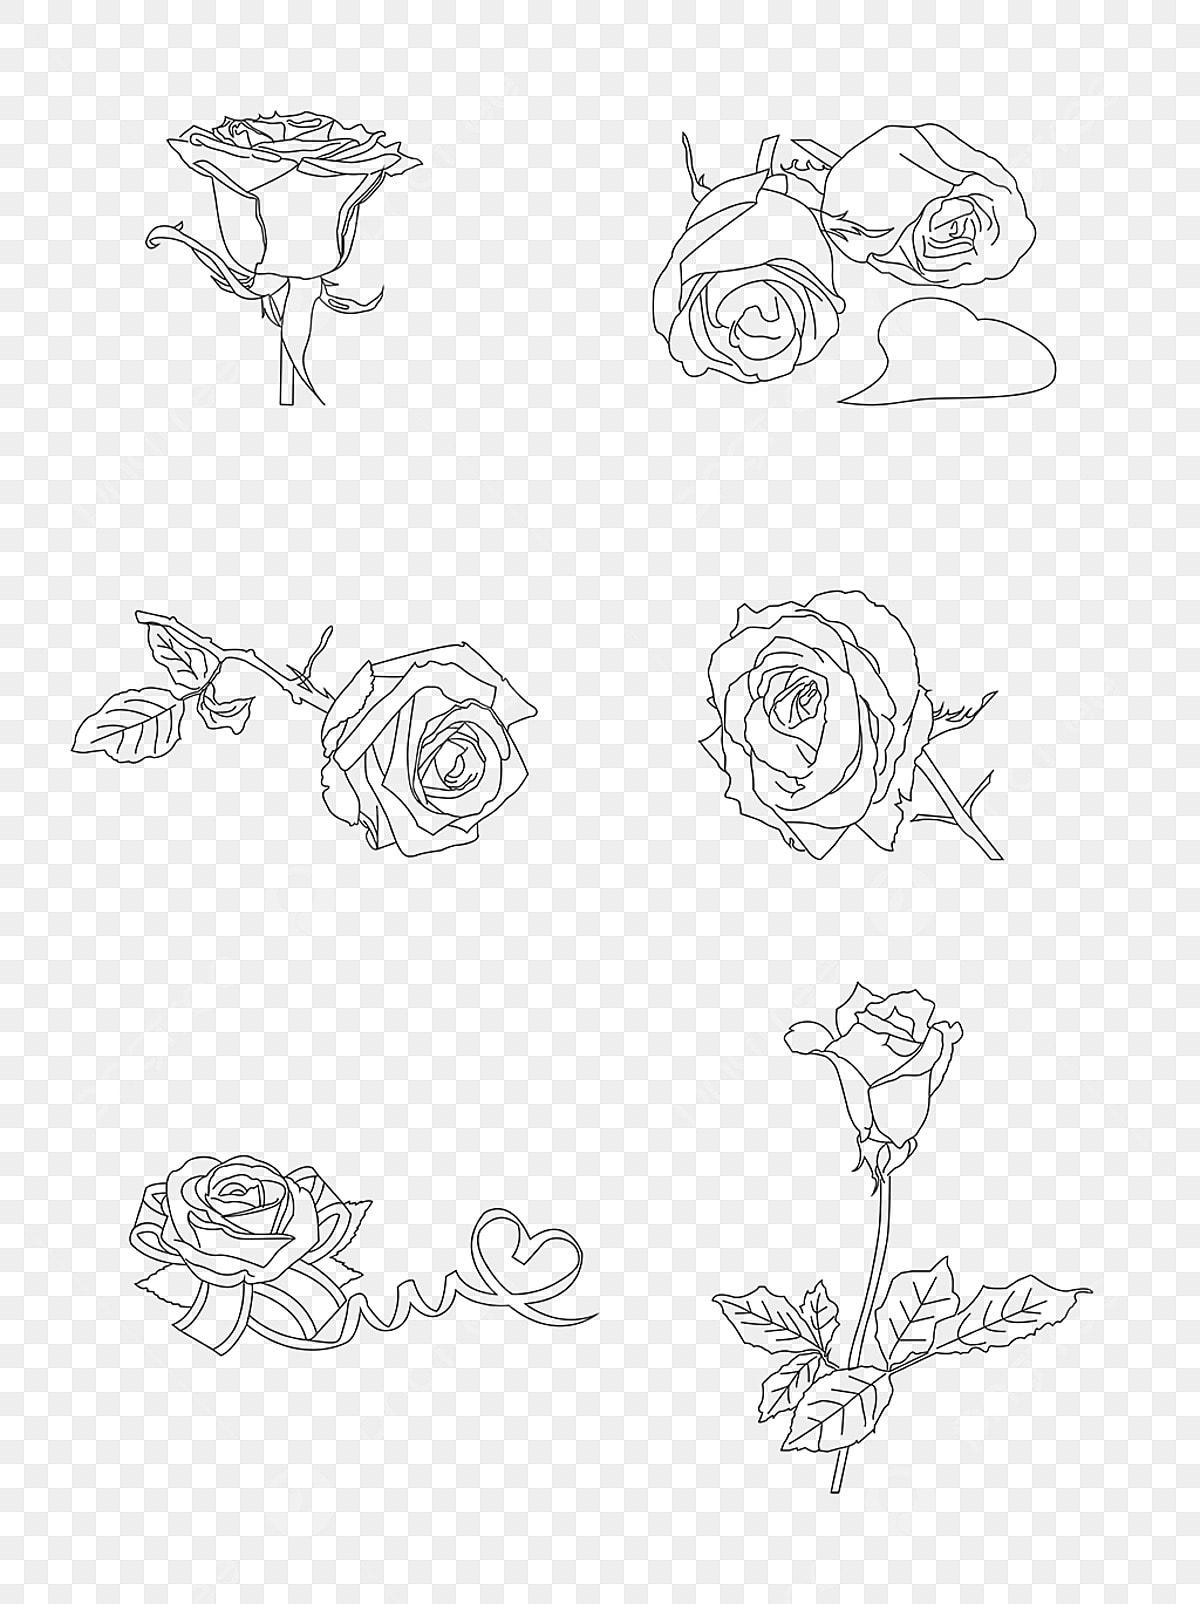 Tanabata Saint Valentin Rose Simple Fleurs Tanabata Saint Valentin Rose Image Png Pour Le Telechargement Libre